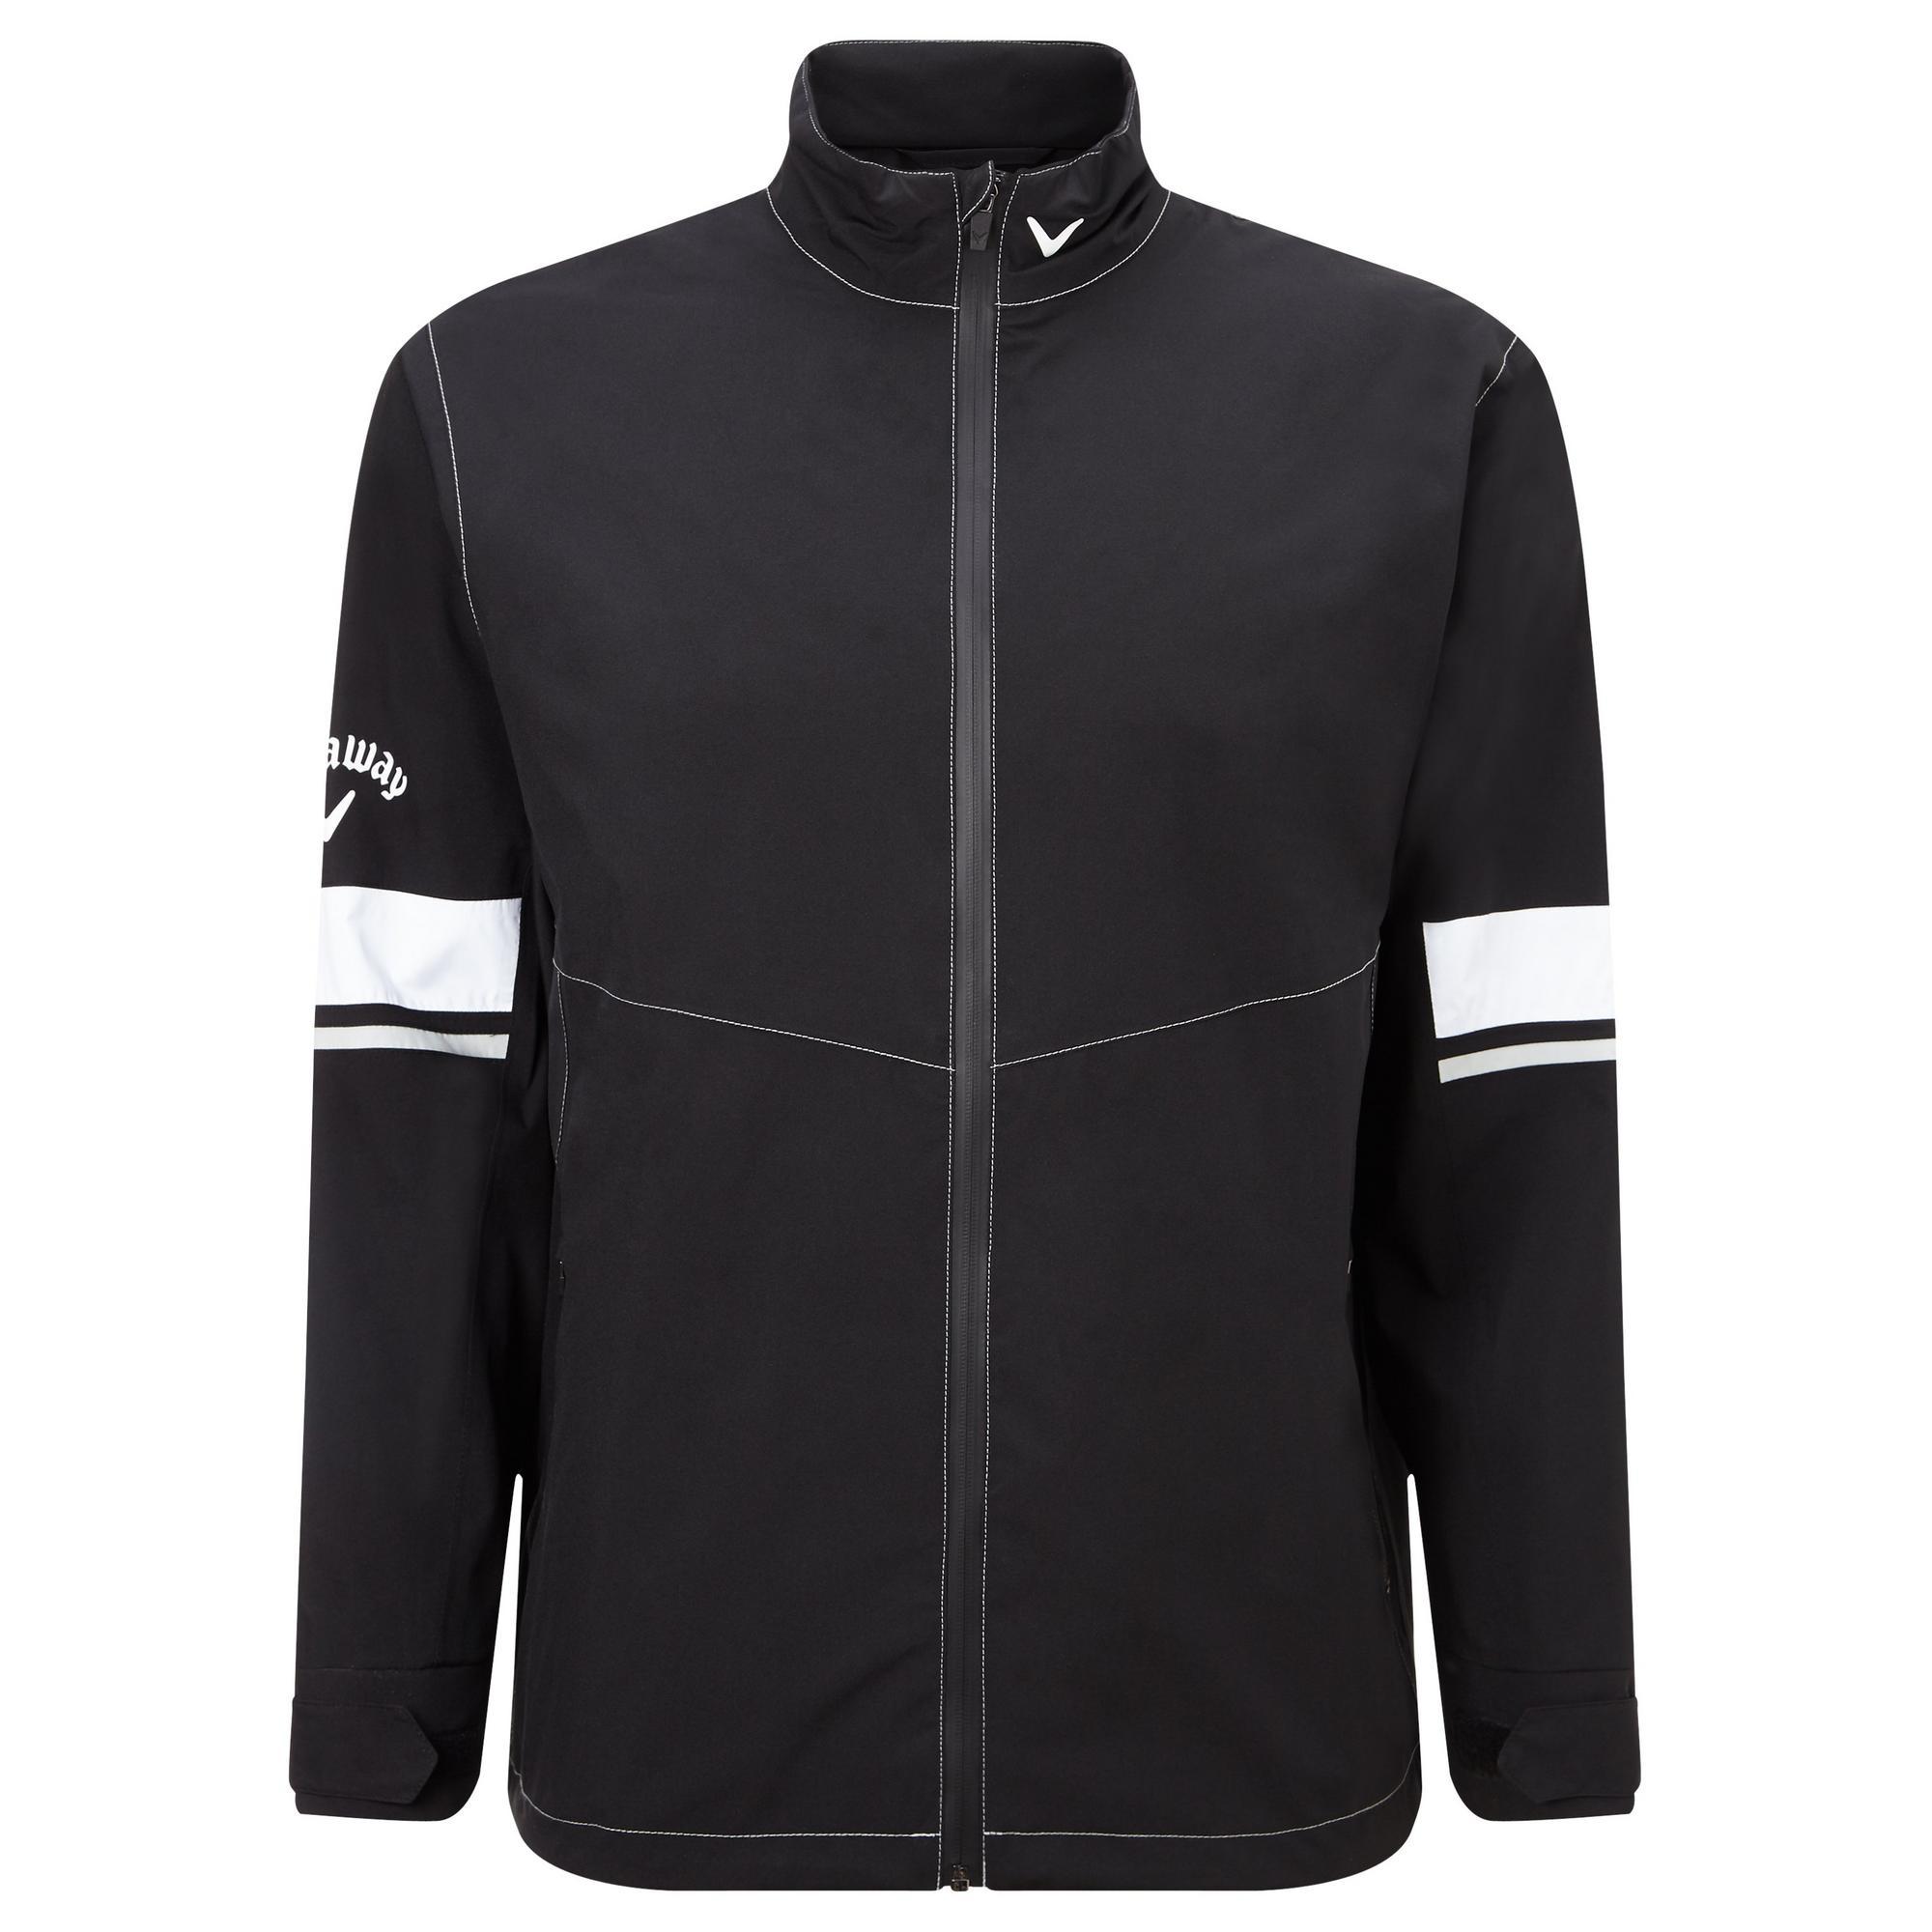 Men's Performance Waterproof Jacket